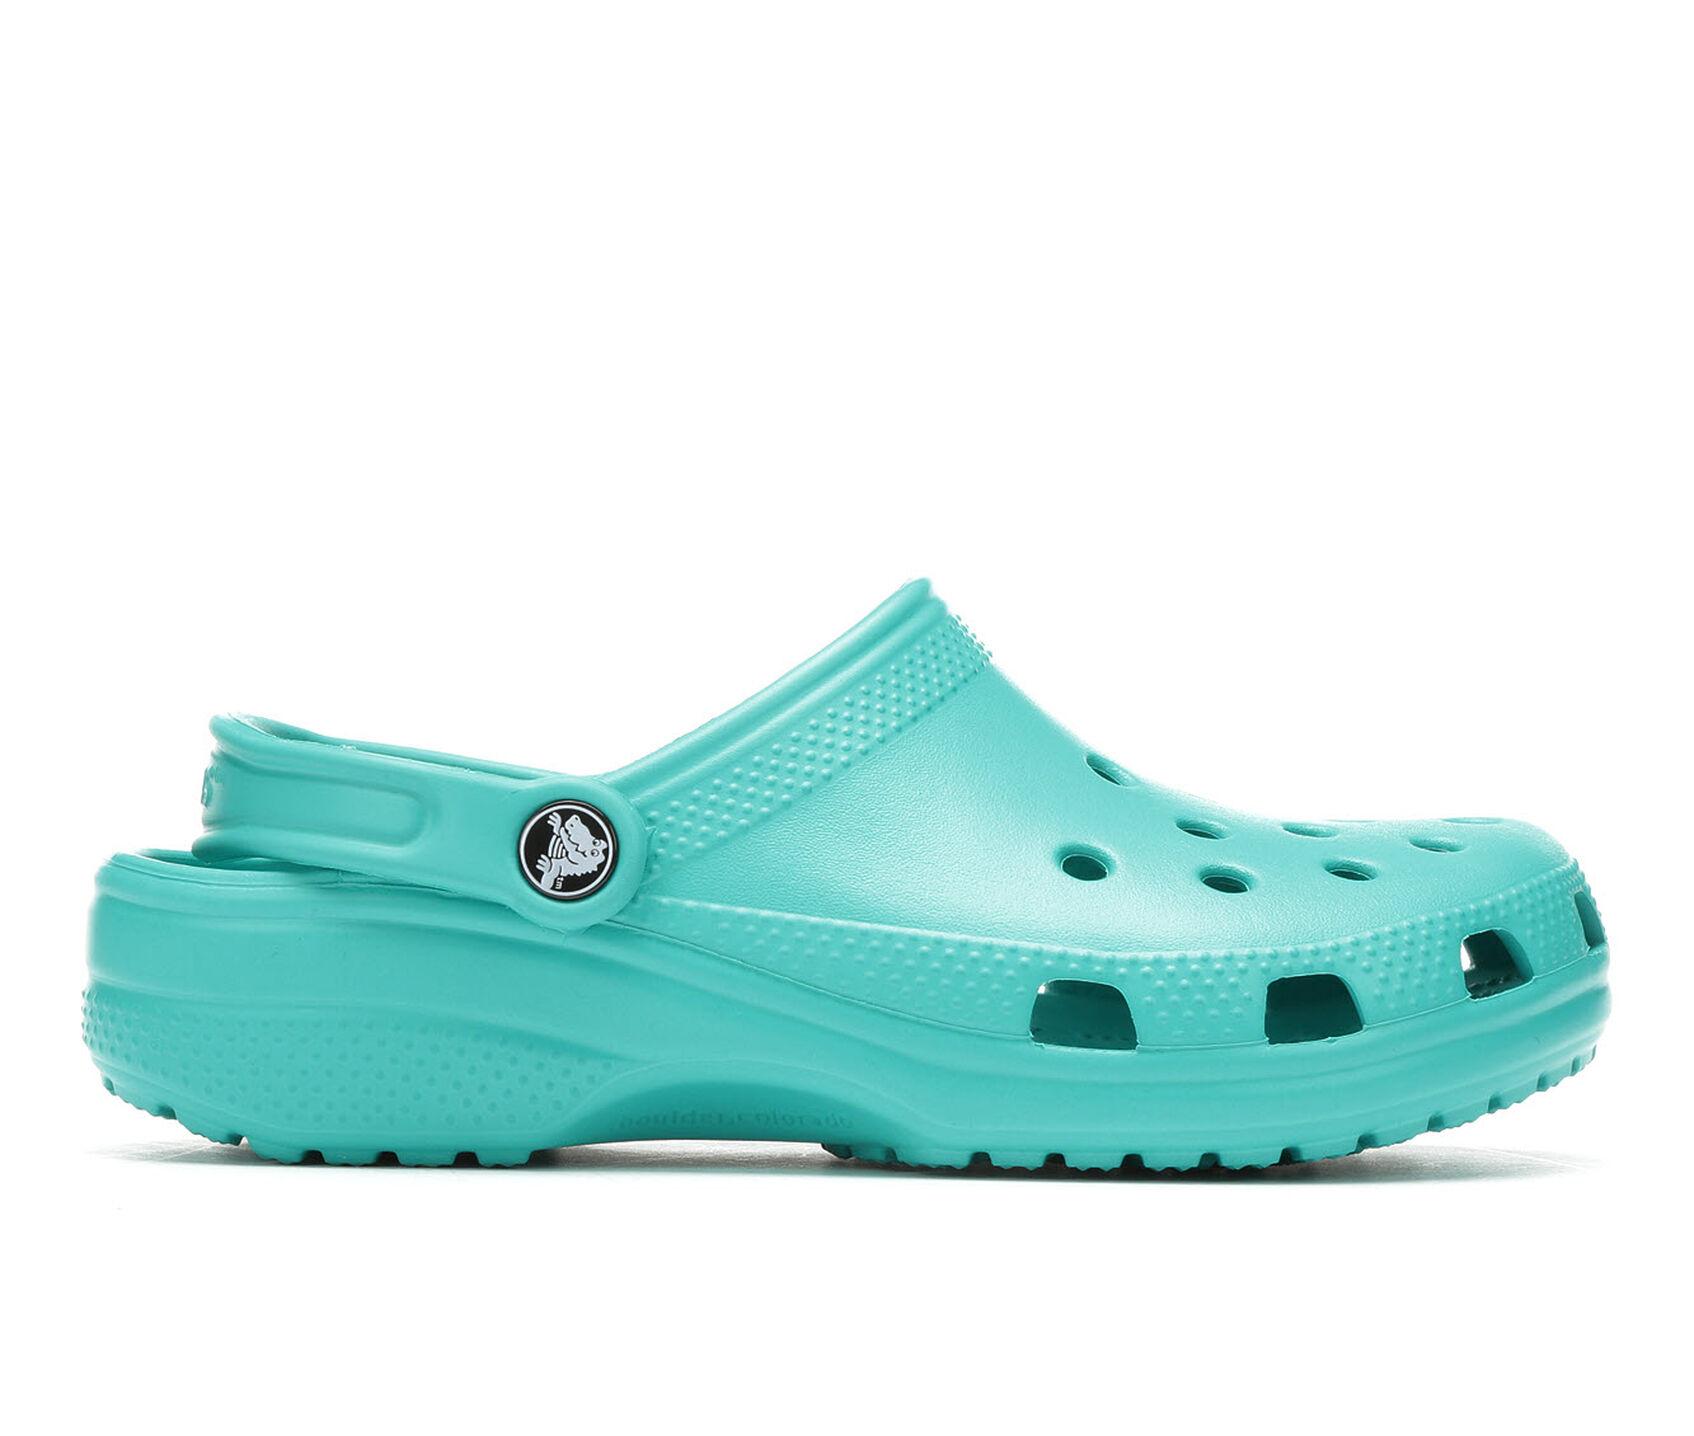 5a1c94020ab4 ... Crocs Classic Clogs. Previous